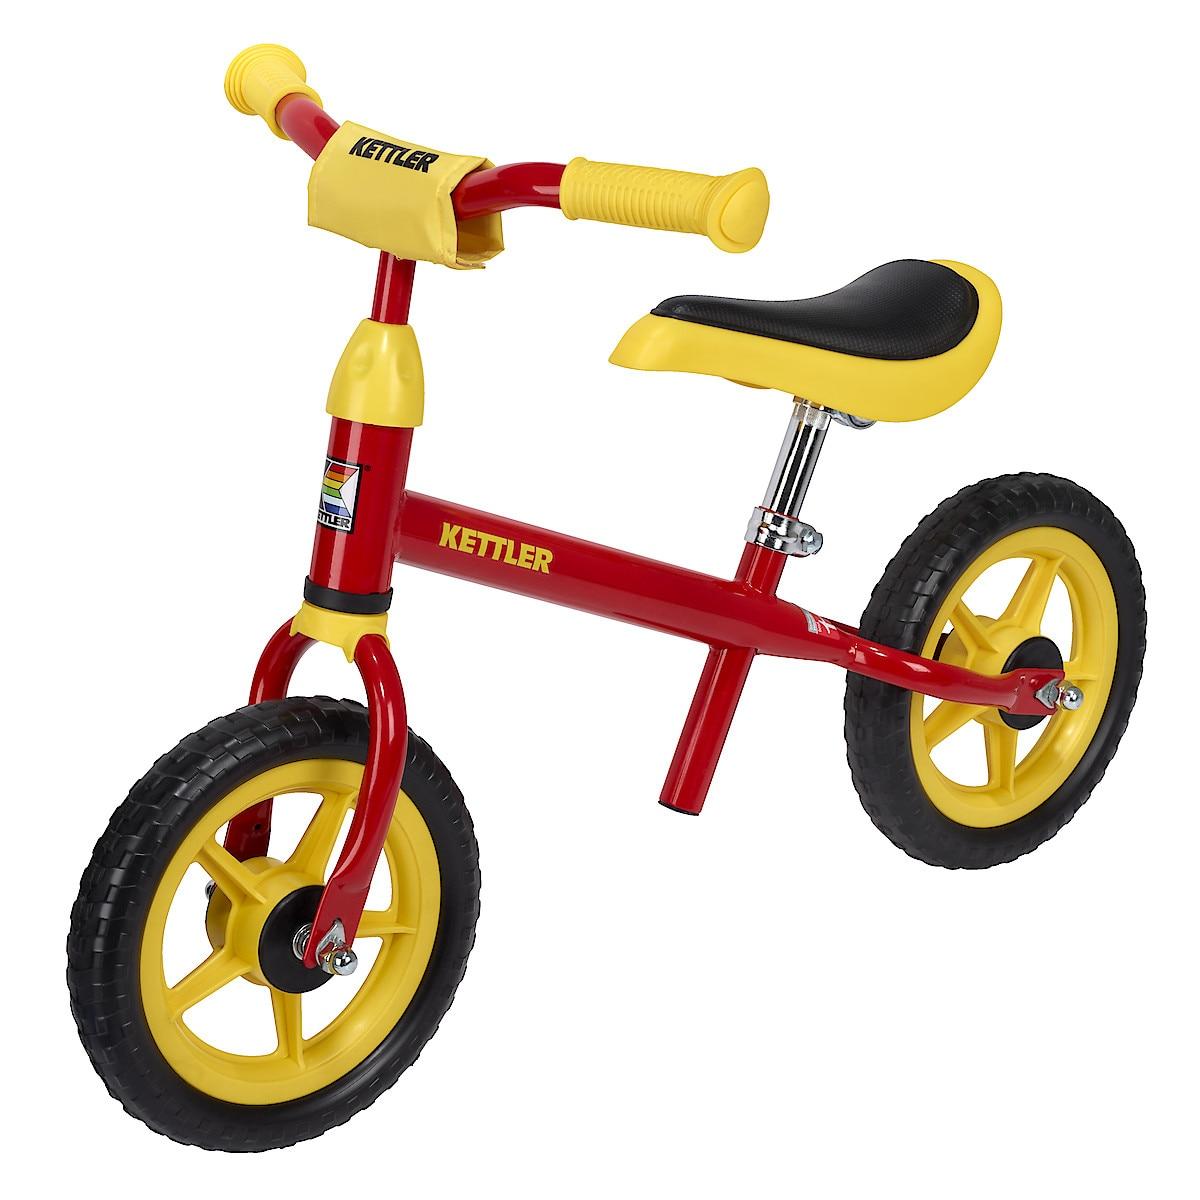 Potkupyörä Kettler Speedy 10